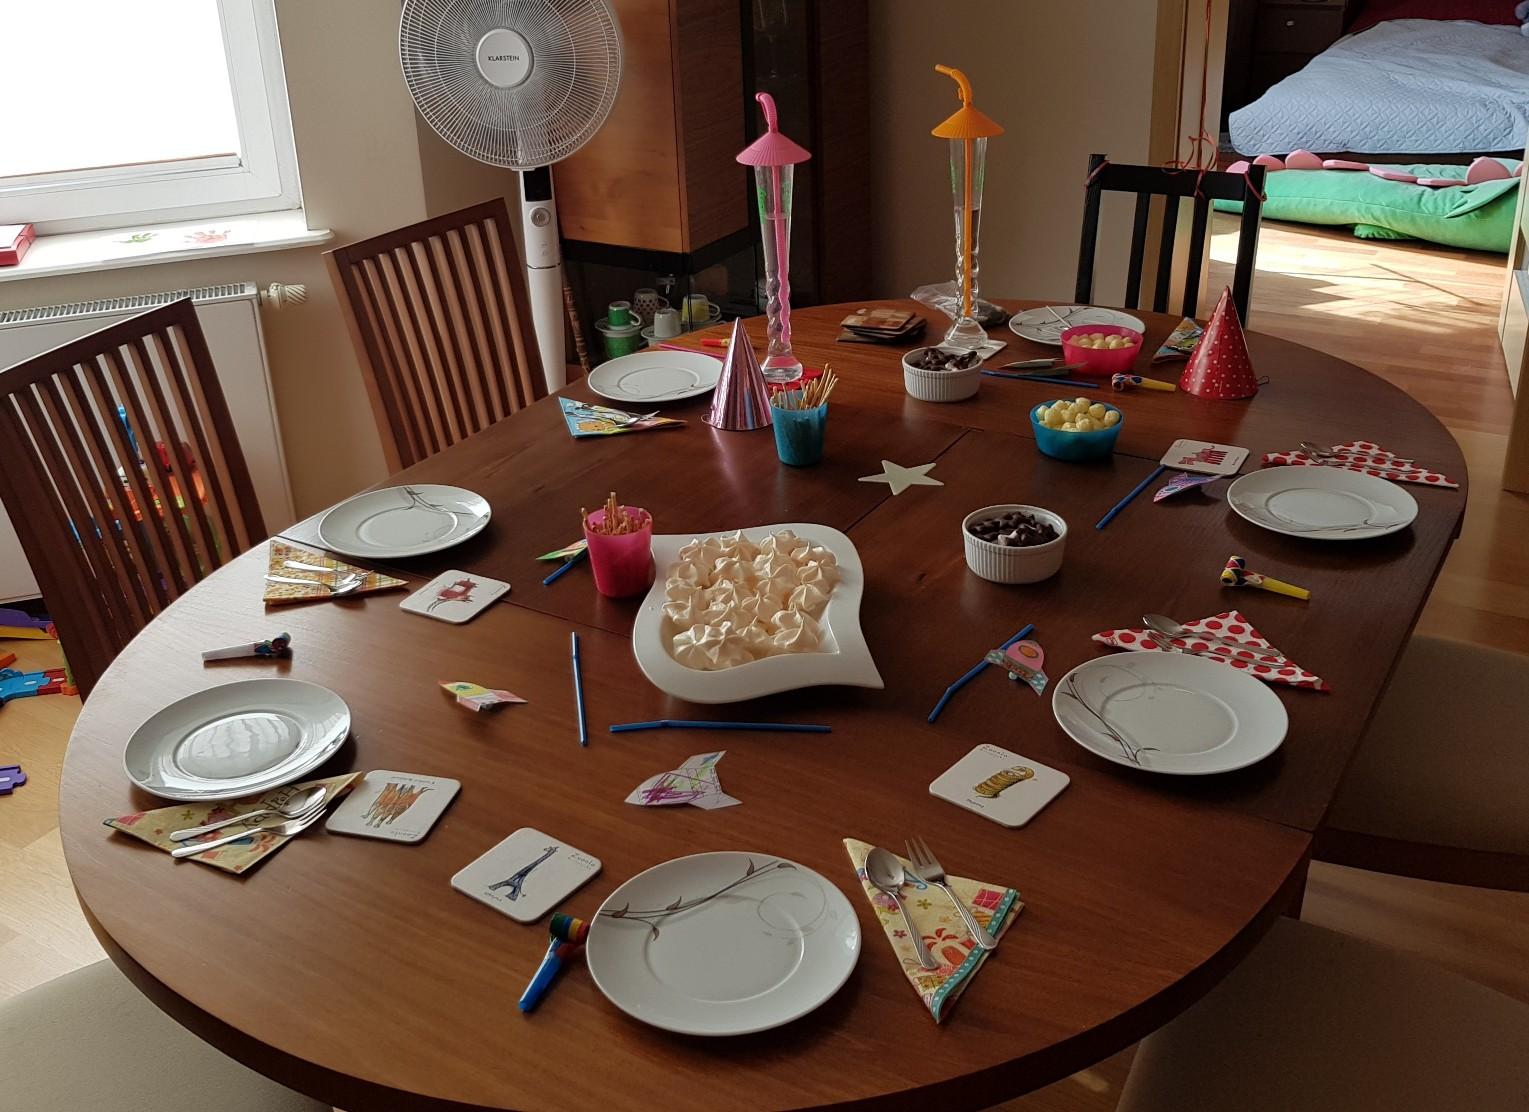 space birthday party ideas start meringue